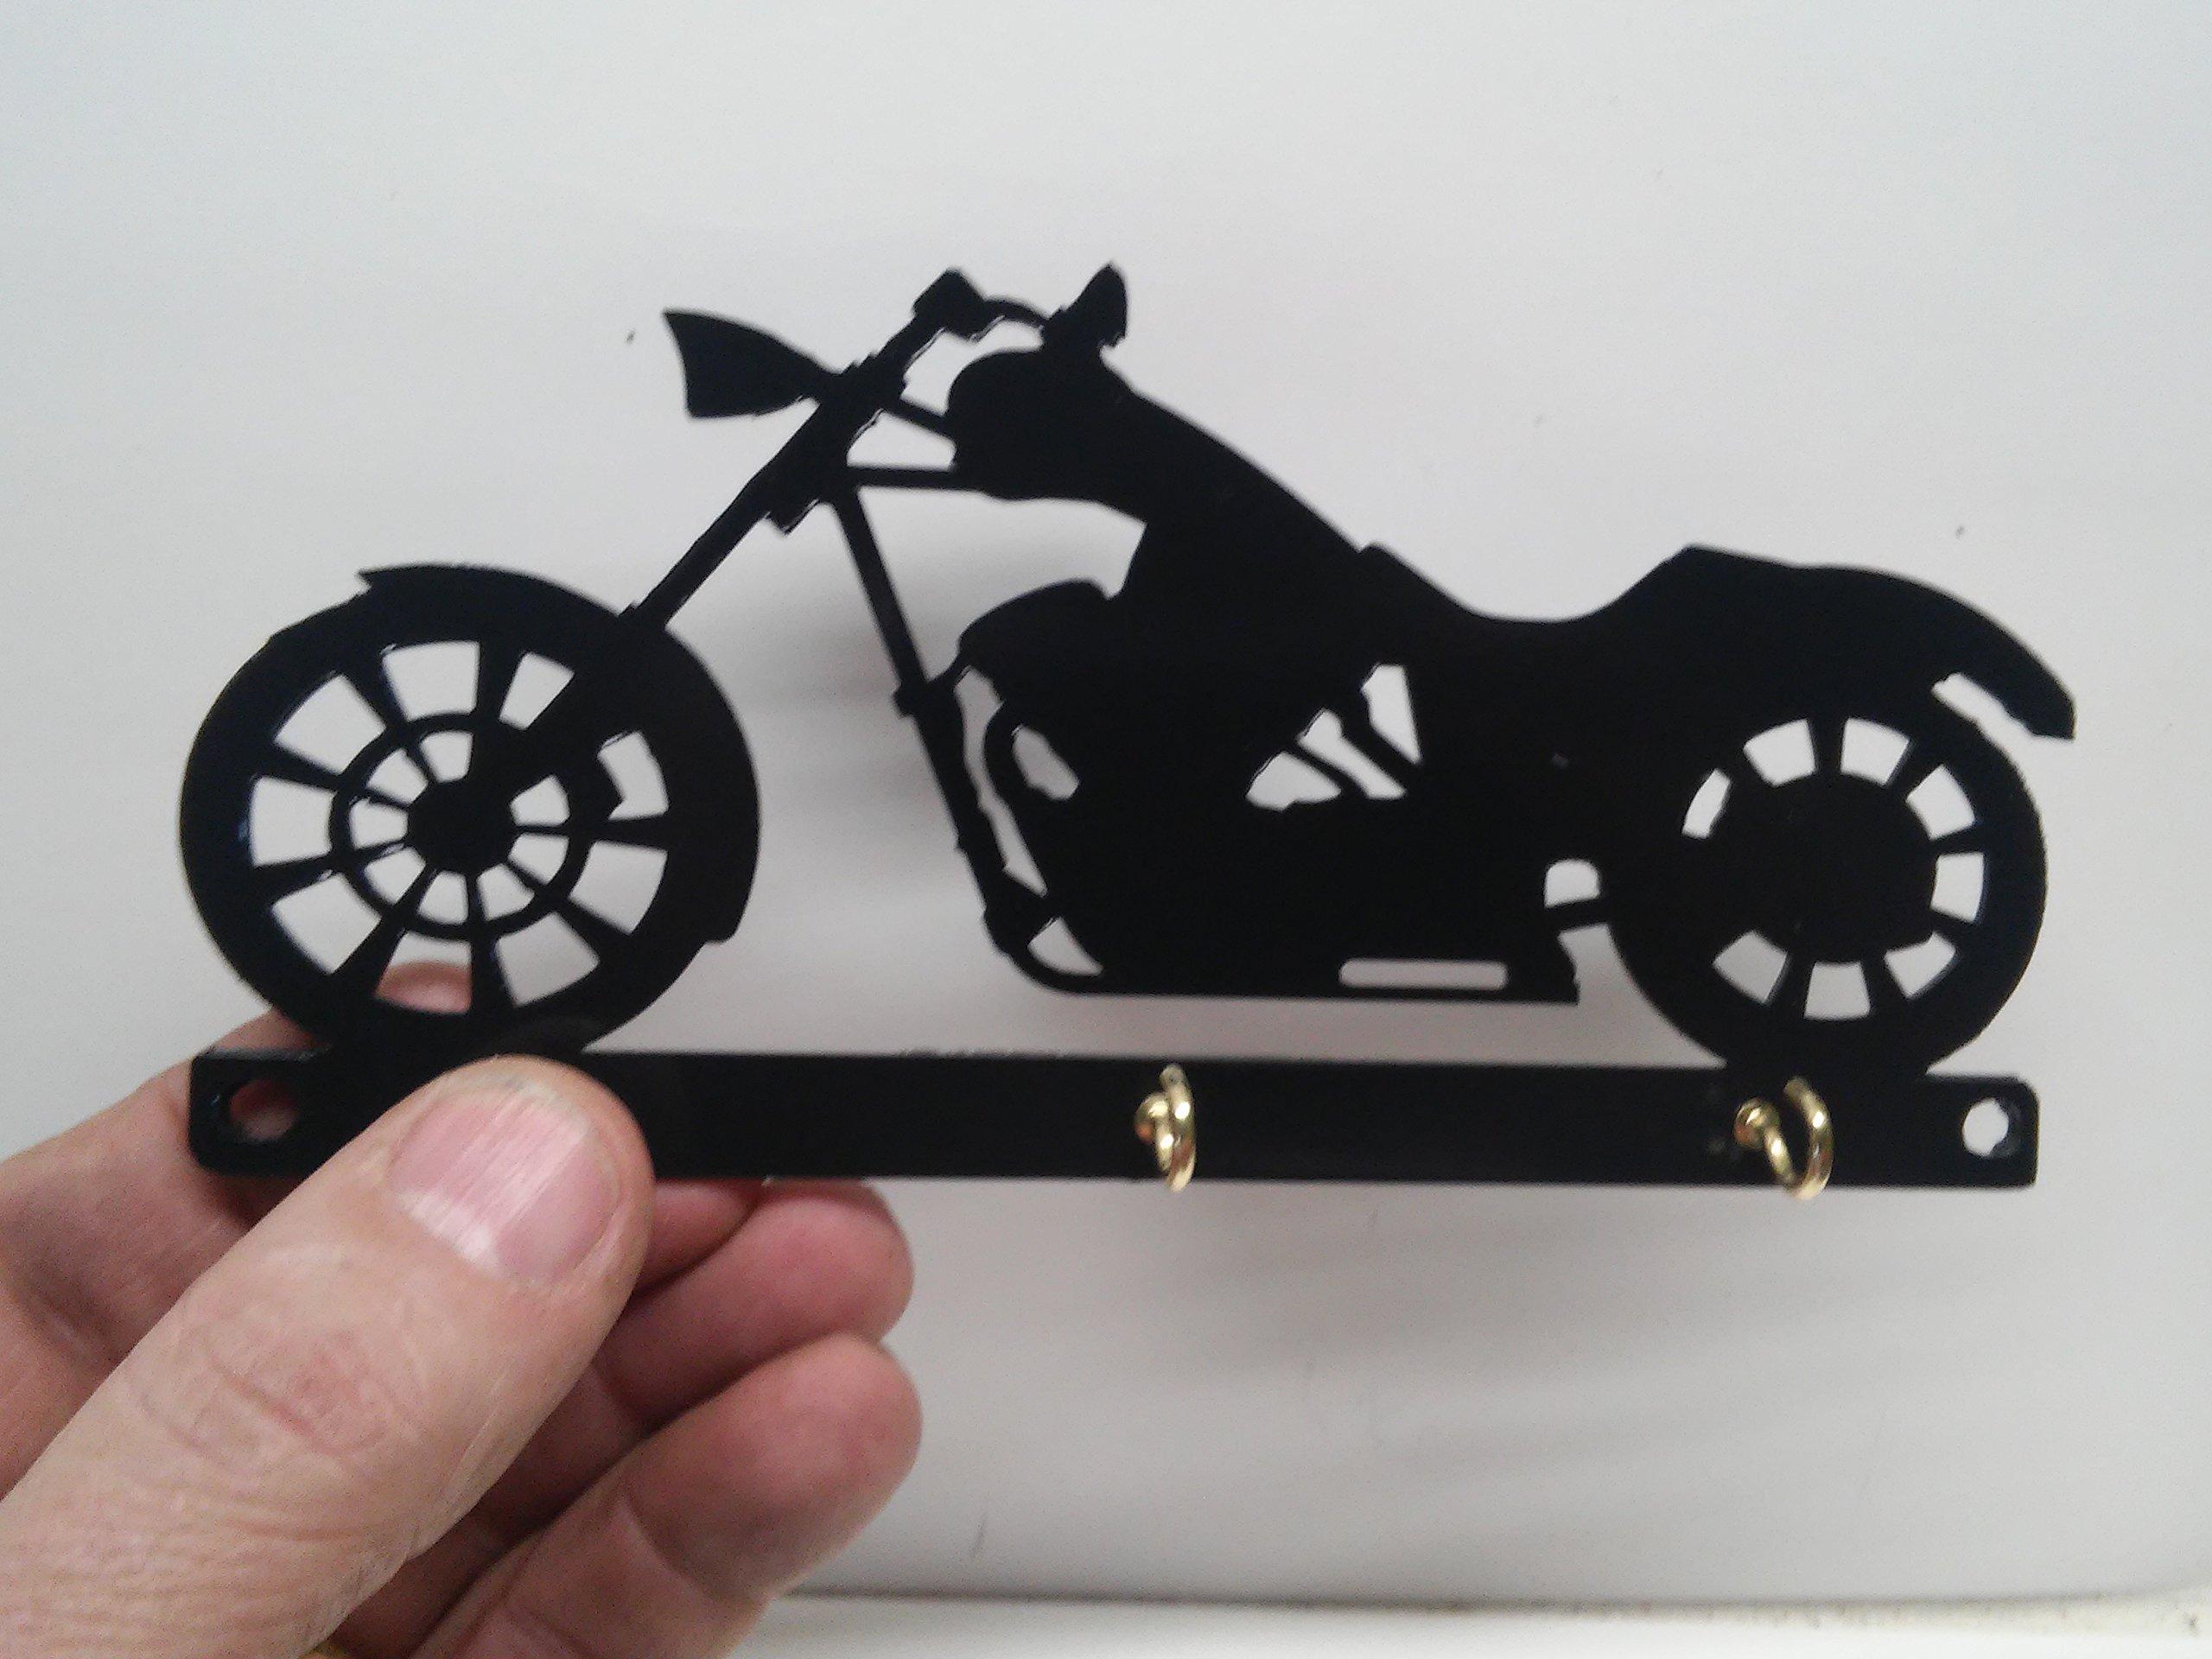 Chopper Motorcycle Key Holder Rack Hook Organizer Wall Mounted by Cycle Key Racks (Image #2)